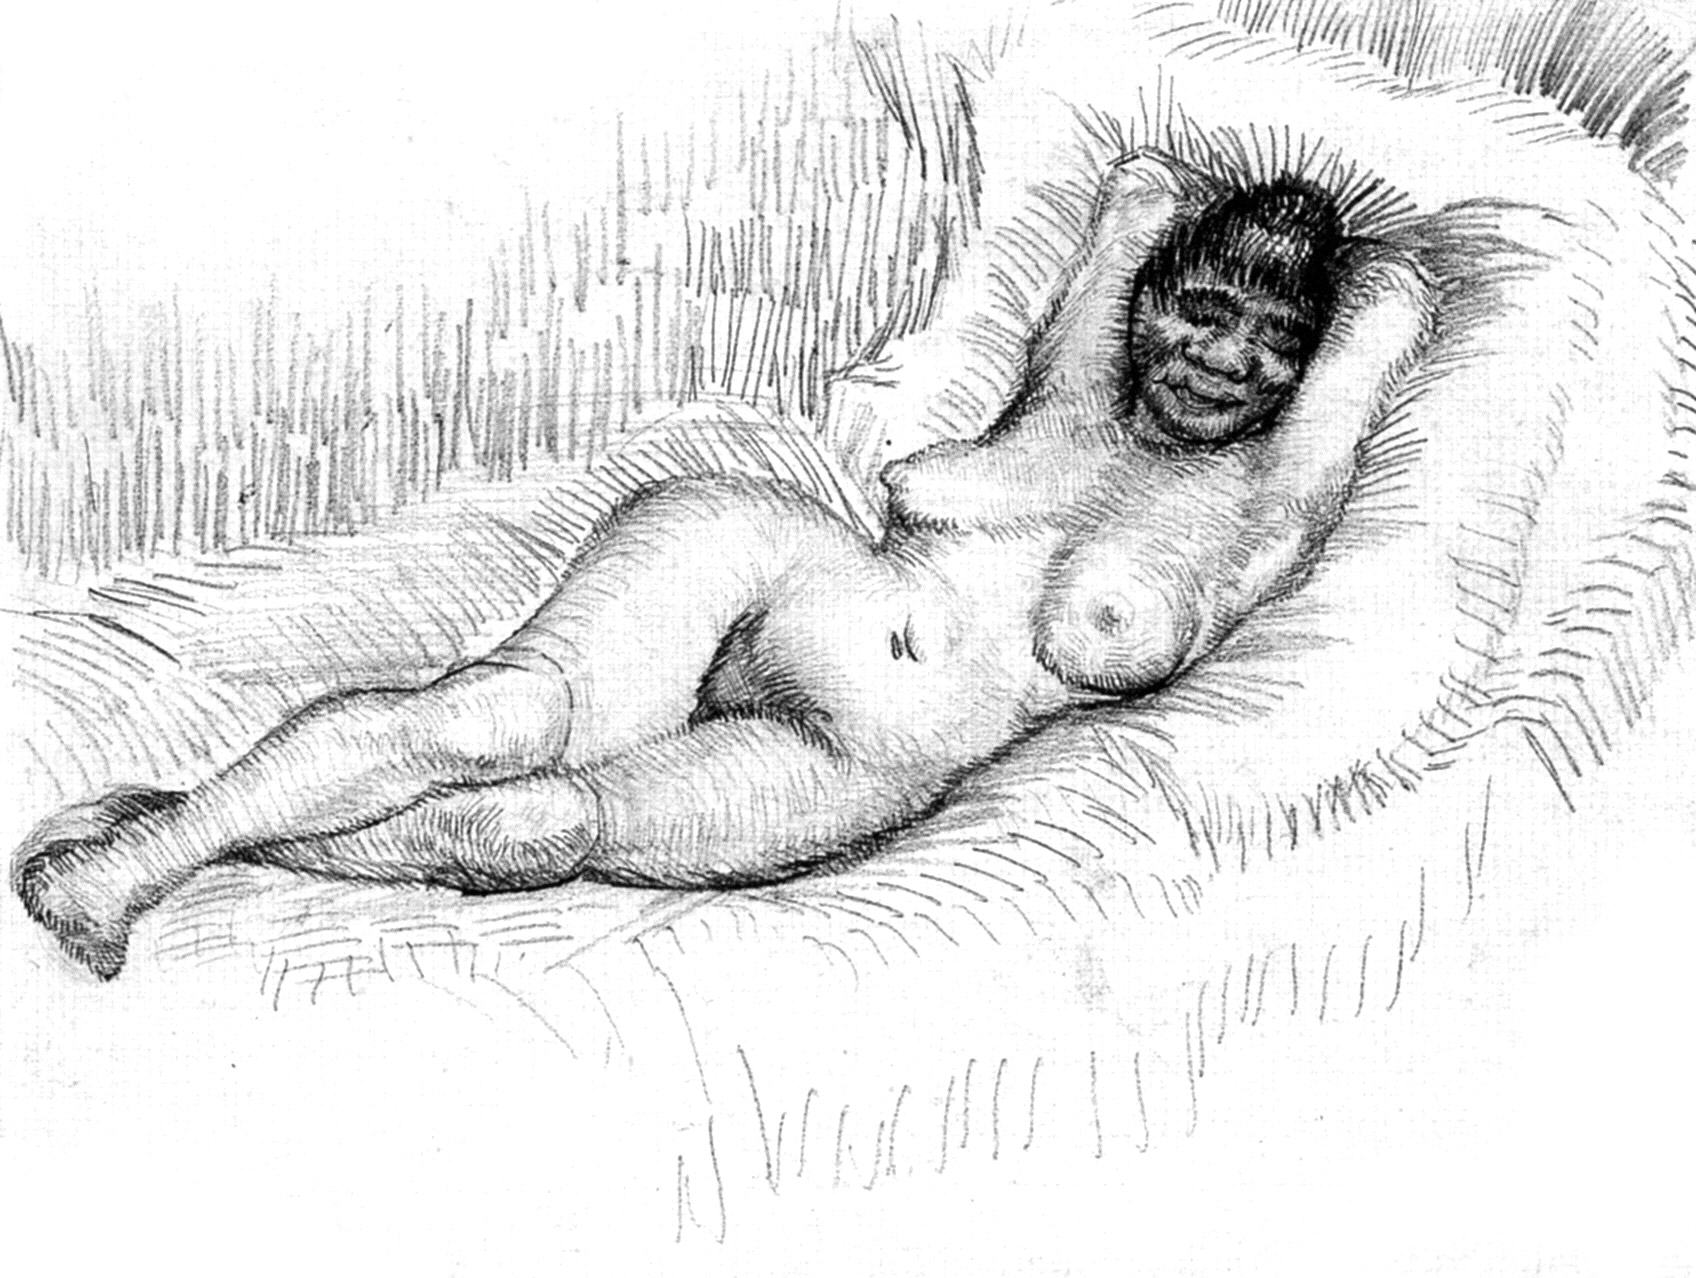 Nude by Van Gogh